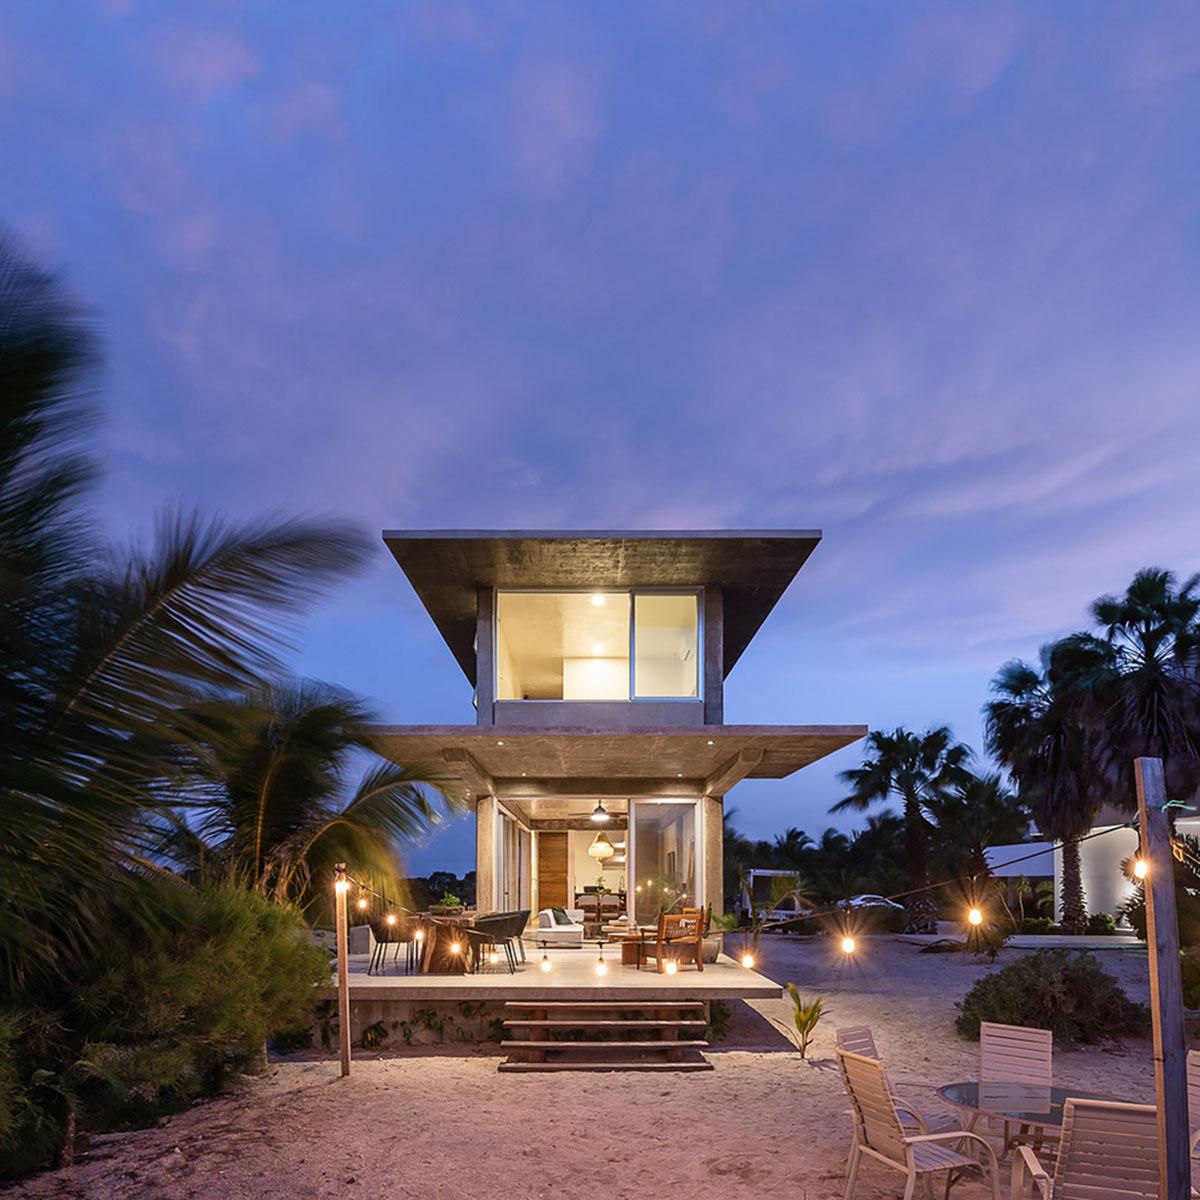 Casa-Gemela-Laboratorio-Arquitectura-Manolo-Solis-05